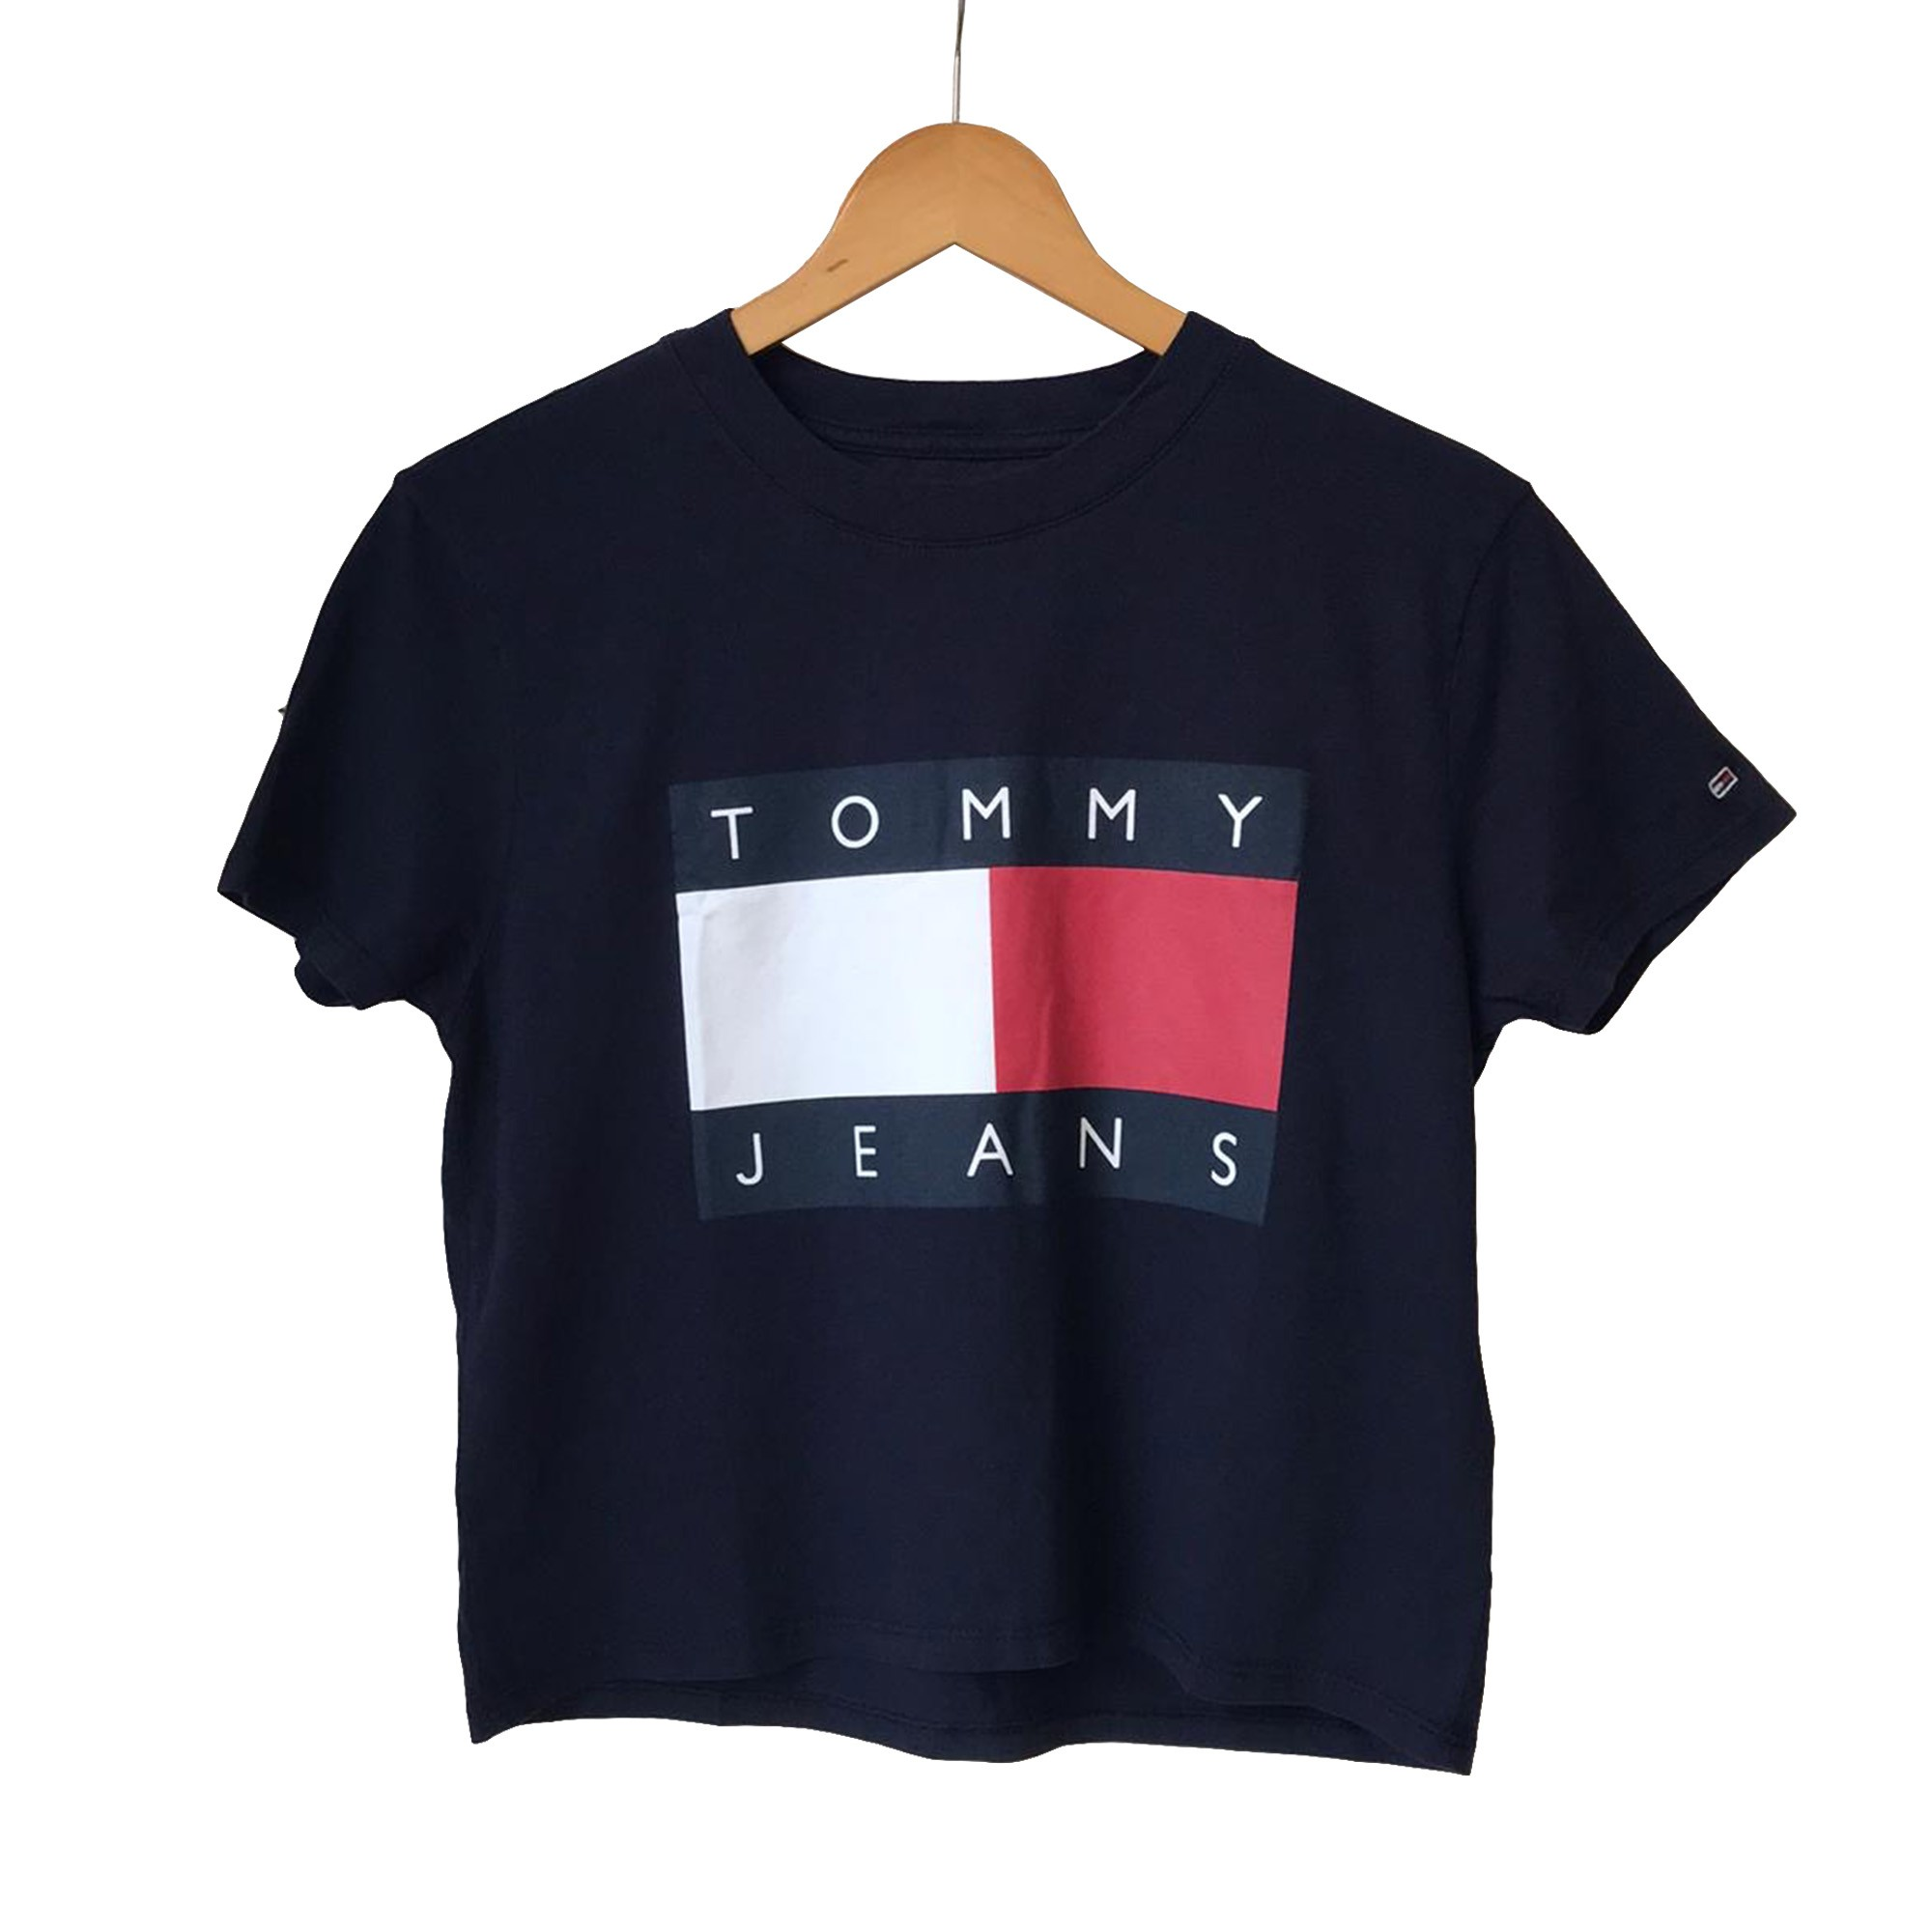 Camiseta Tommy Jeans azul